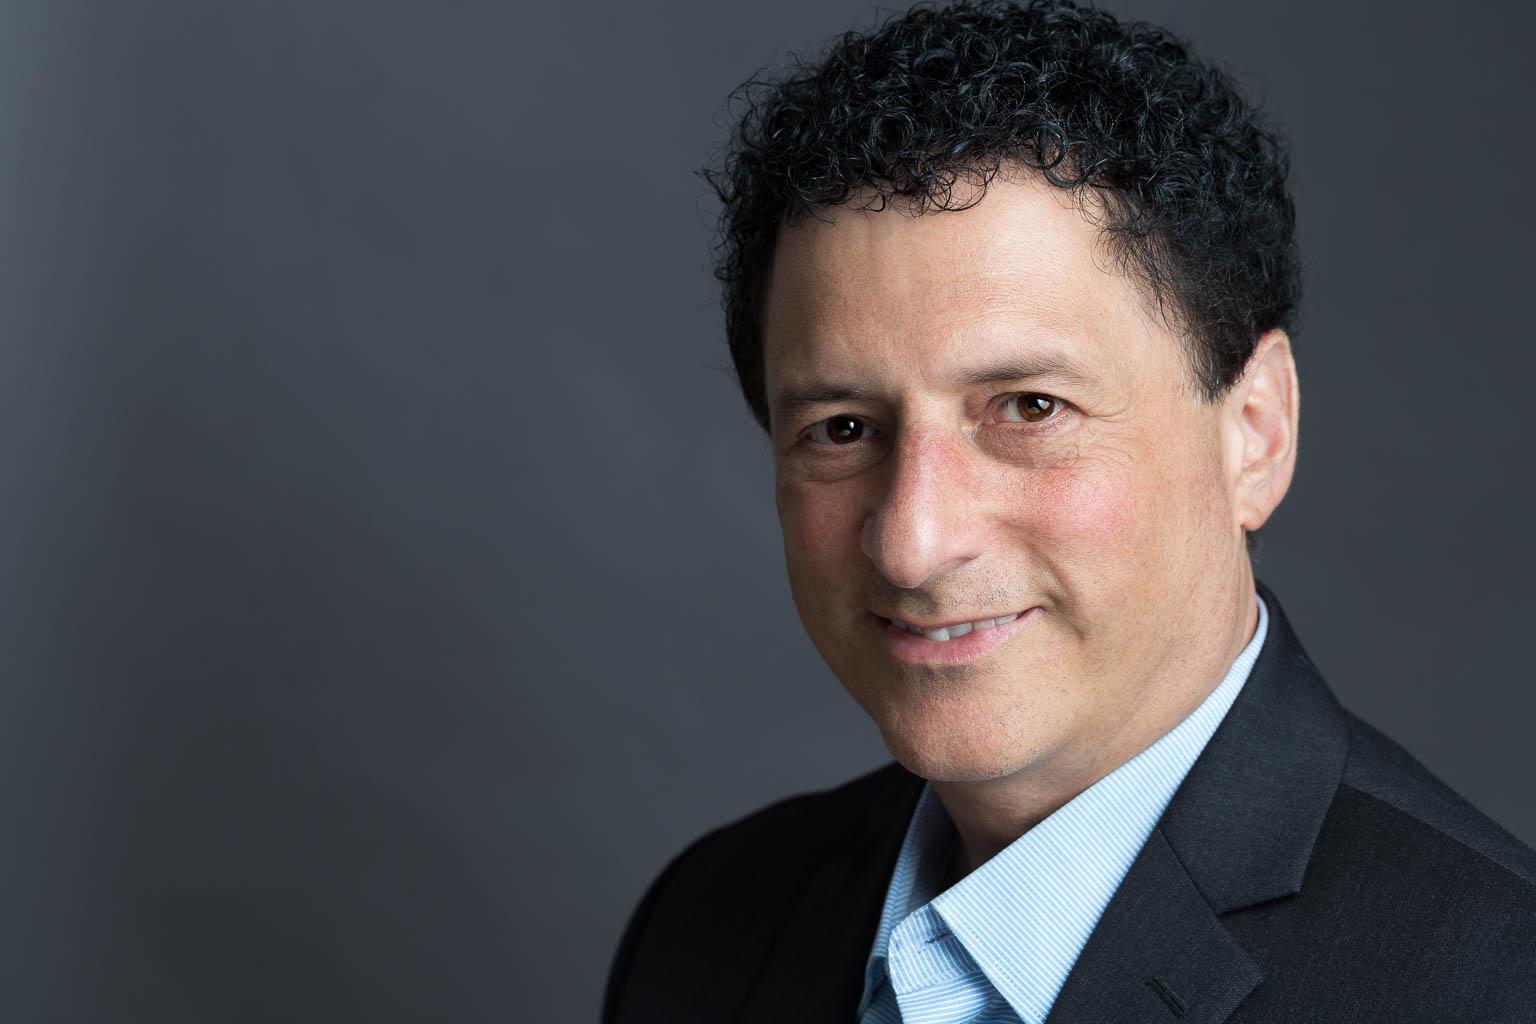 Male Headshot Gray Background Curly Hair | Chicago Headshot Photographer